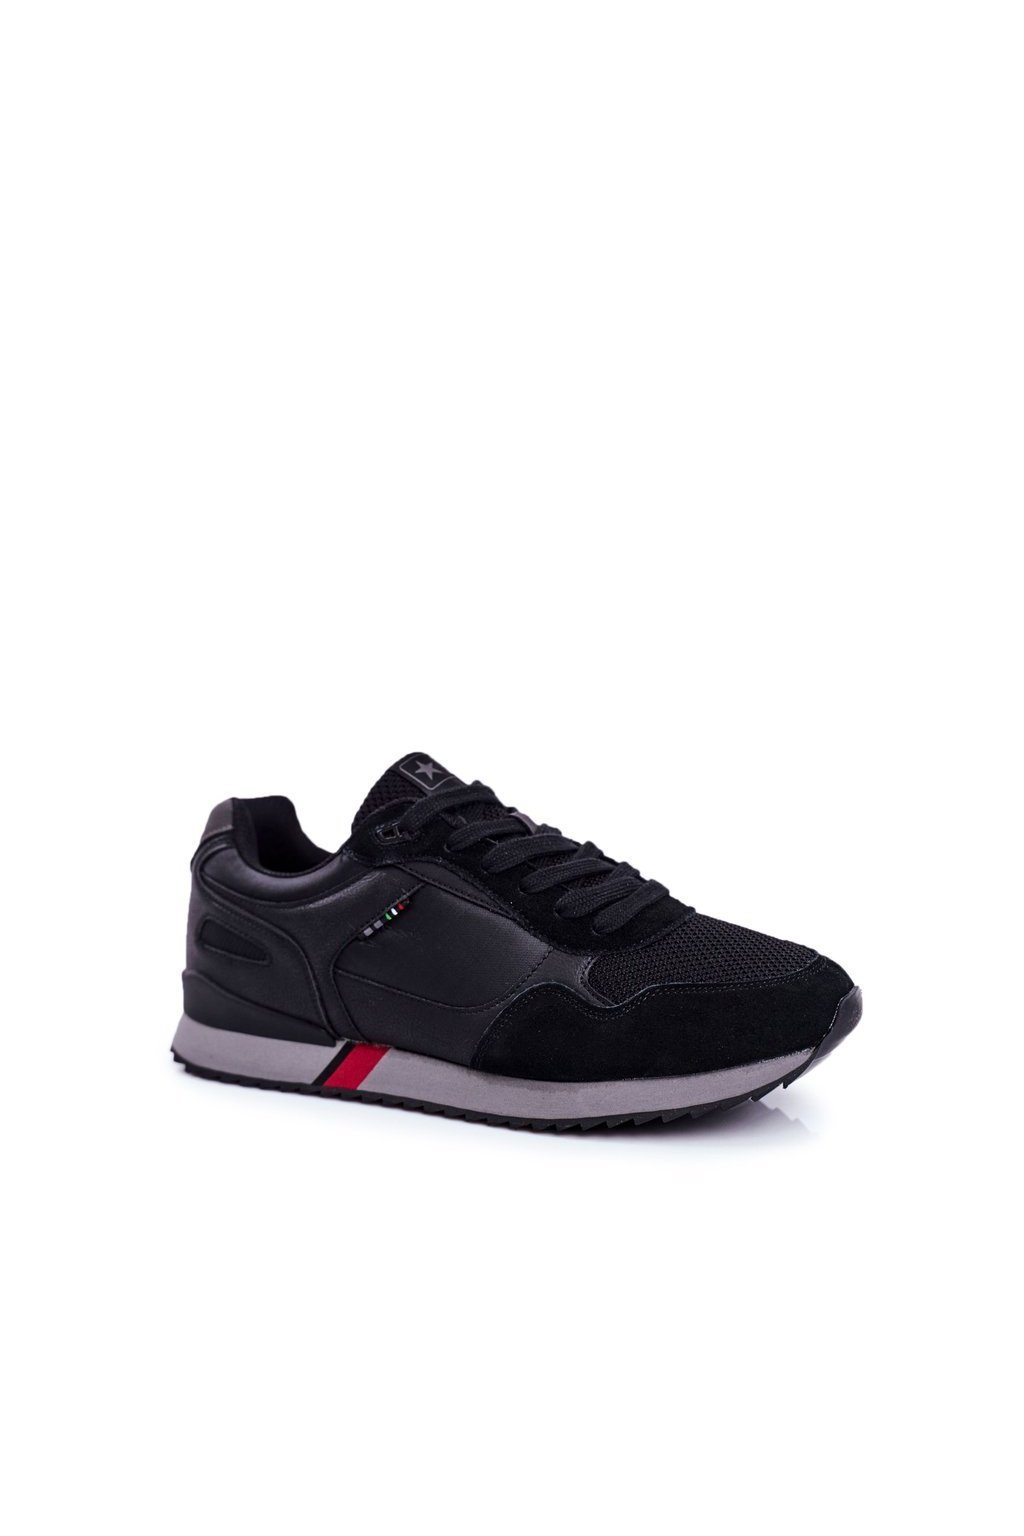 Čierna obuv NJSK 20MN20-2151 BLK